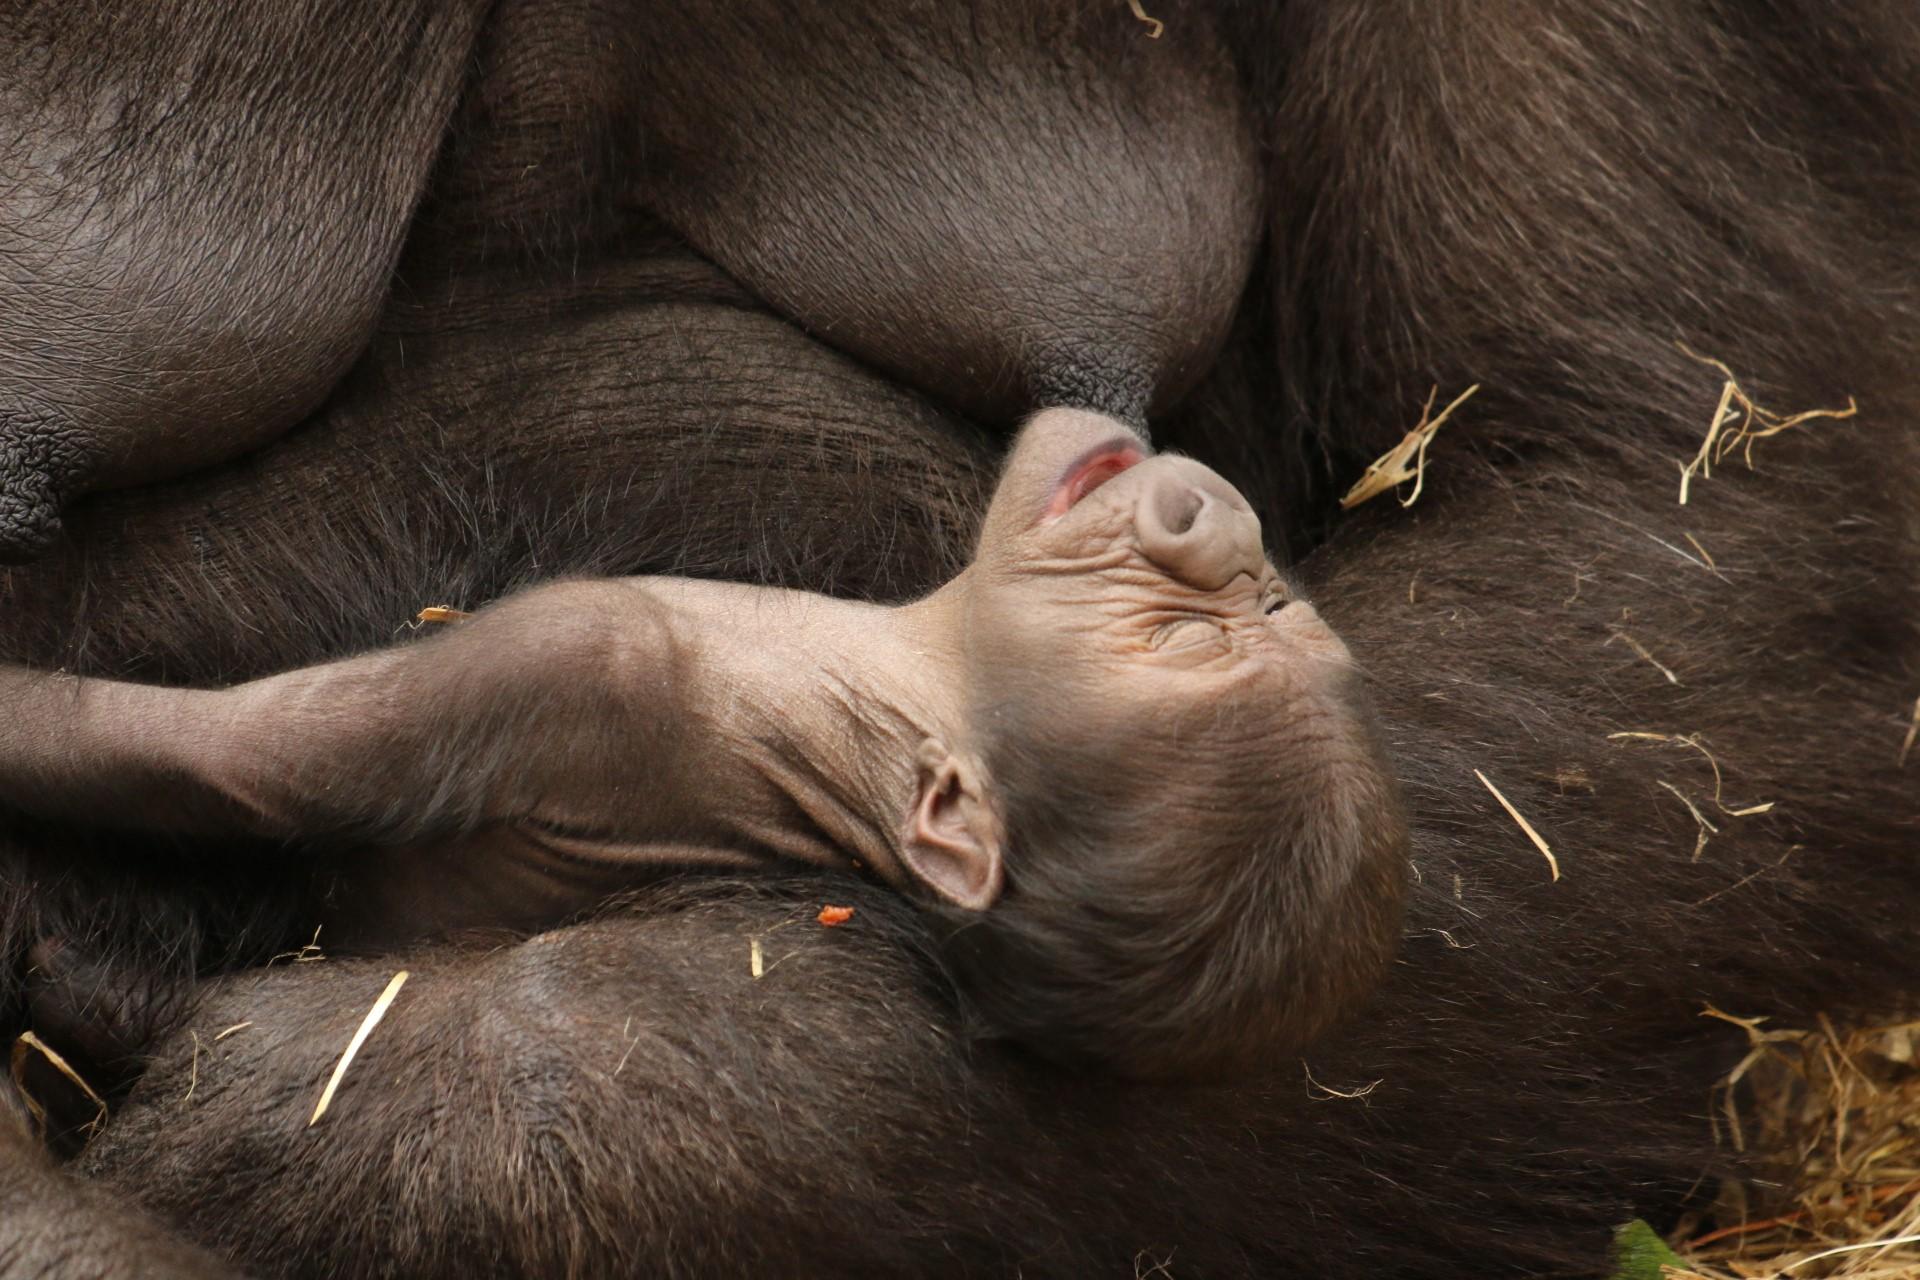 Beautiful baby gorilla at Howletts Wild Animal Park c Howletts Wild Animal Park